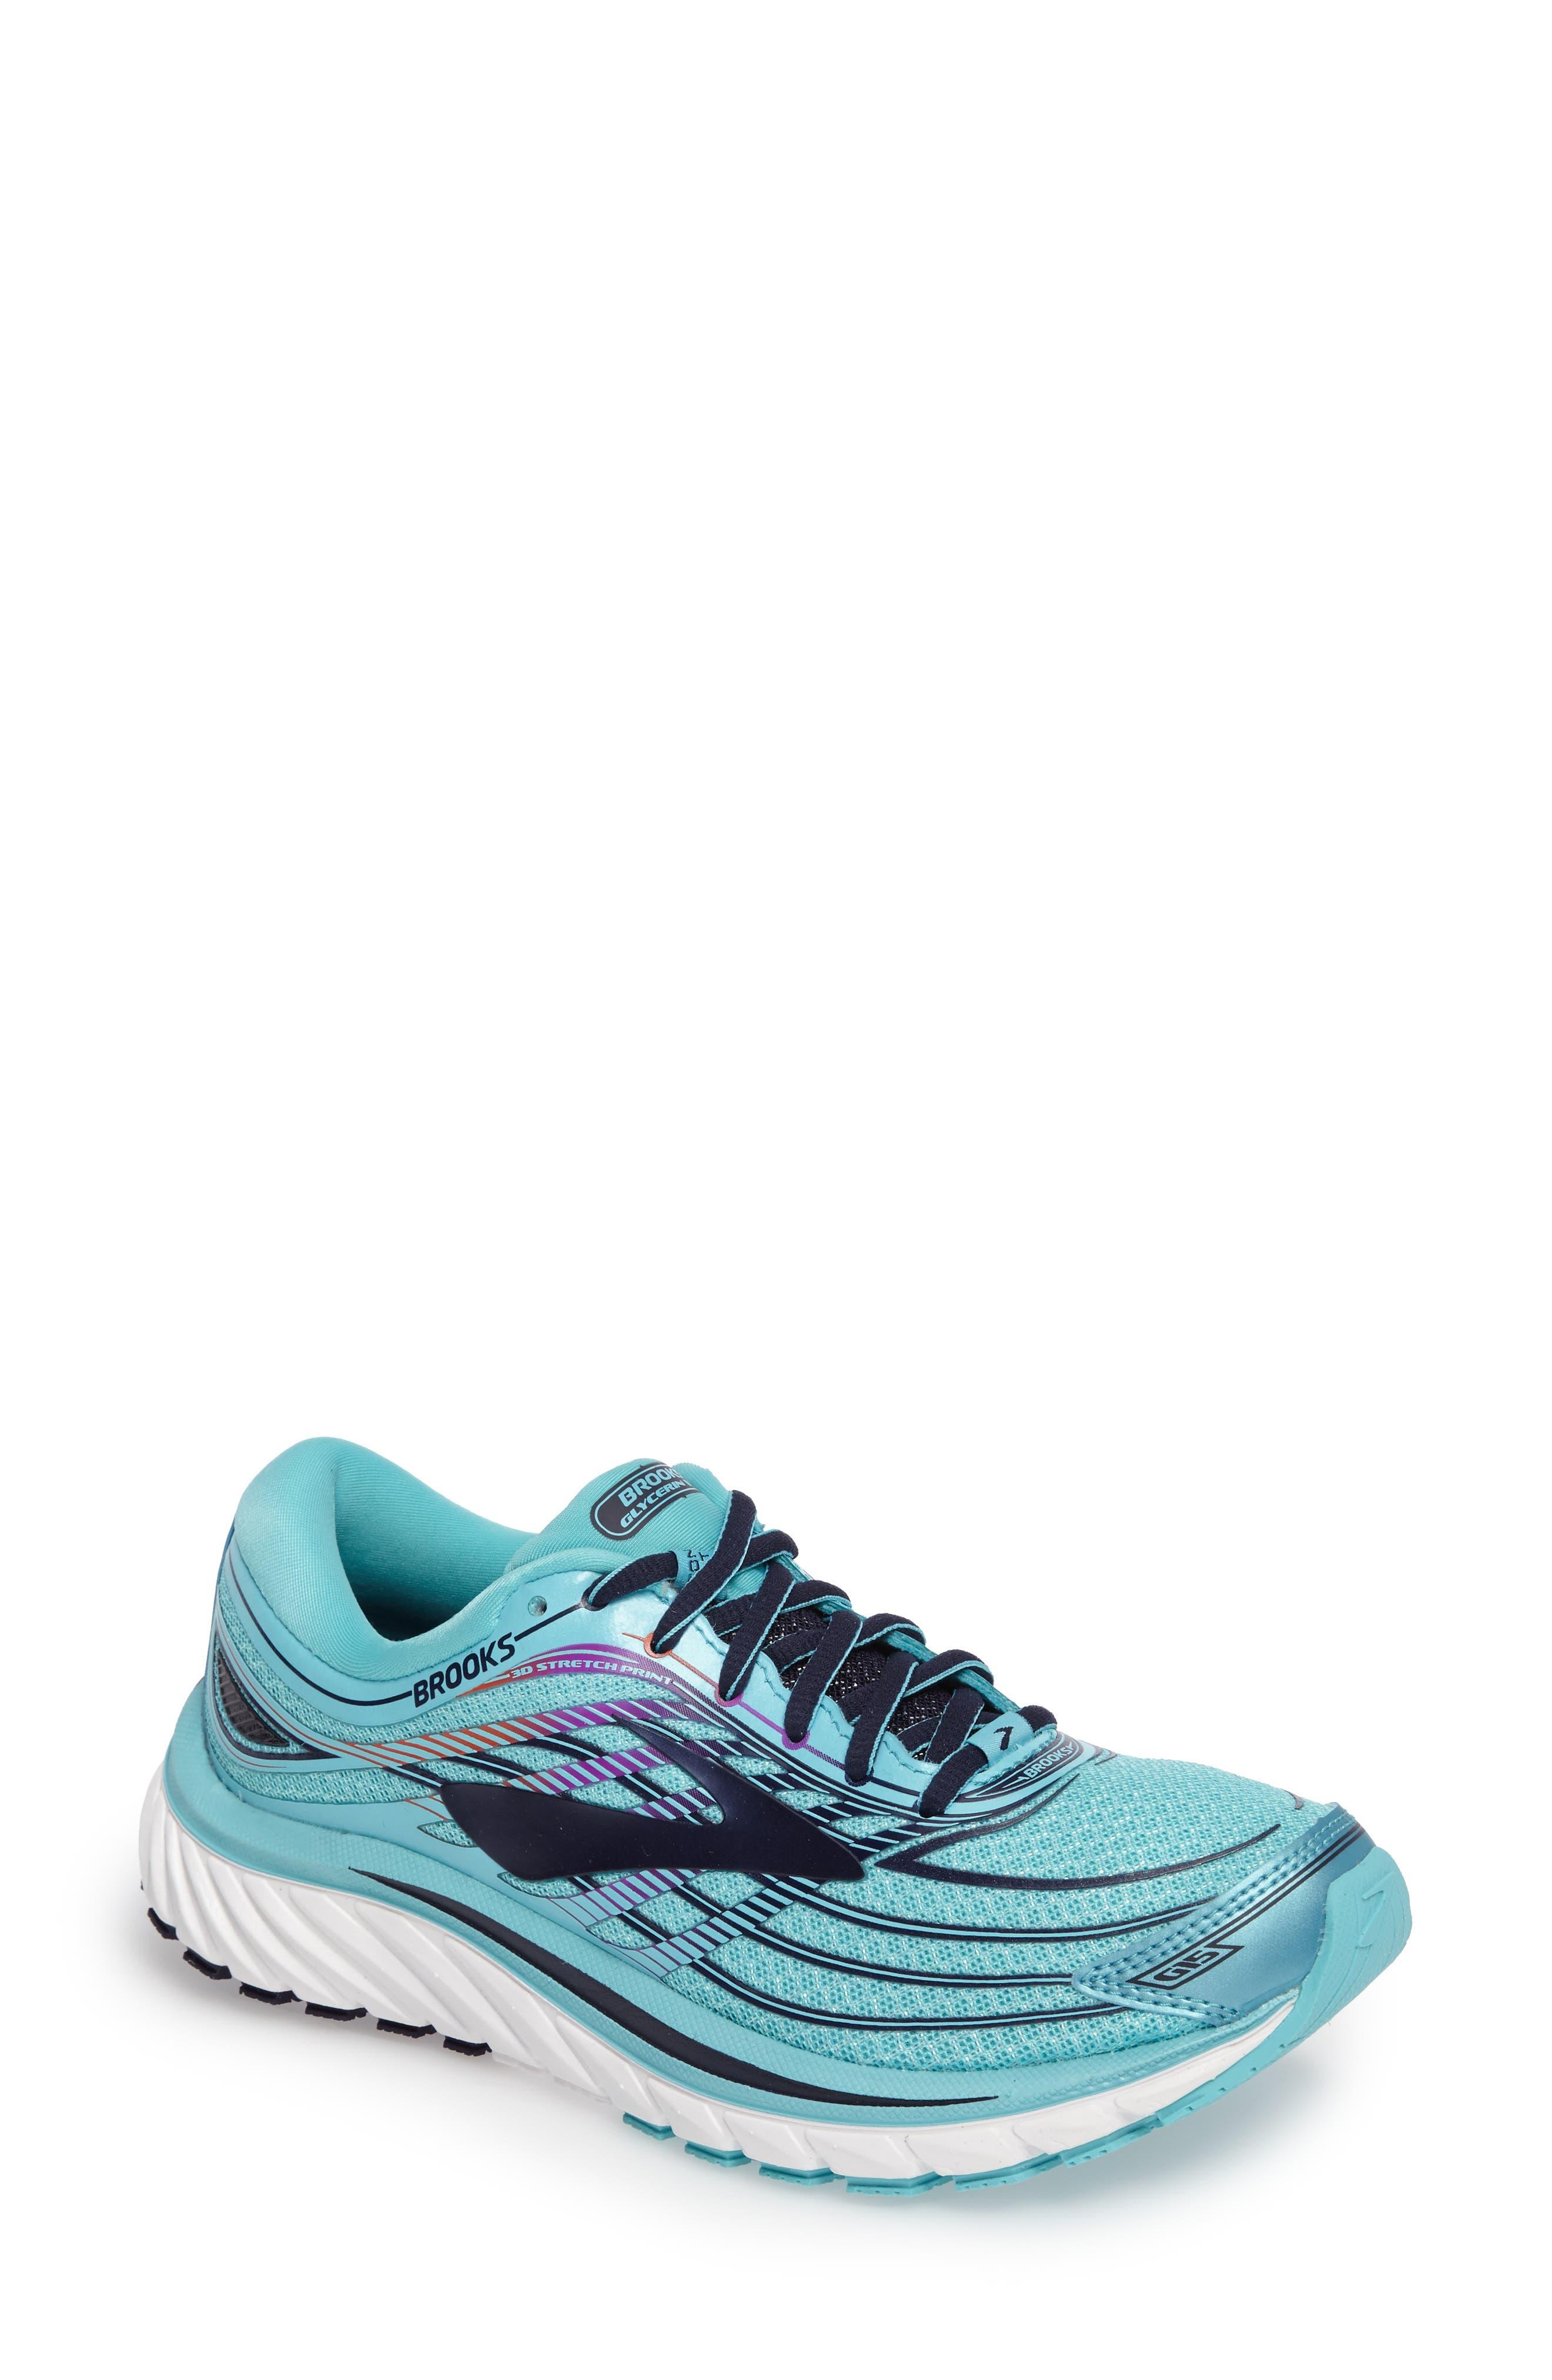 Alternate Image 1 Selected - Brooks Glycerin 15 Running Shoe (Women)